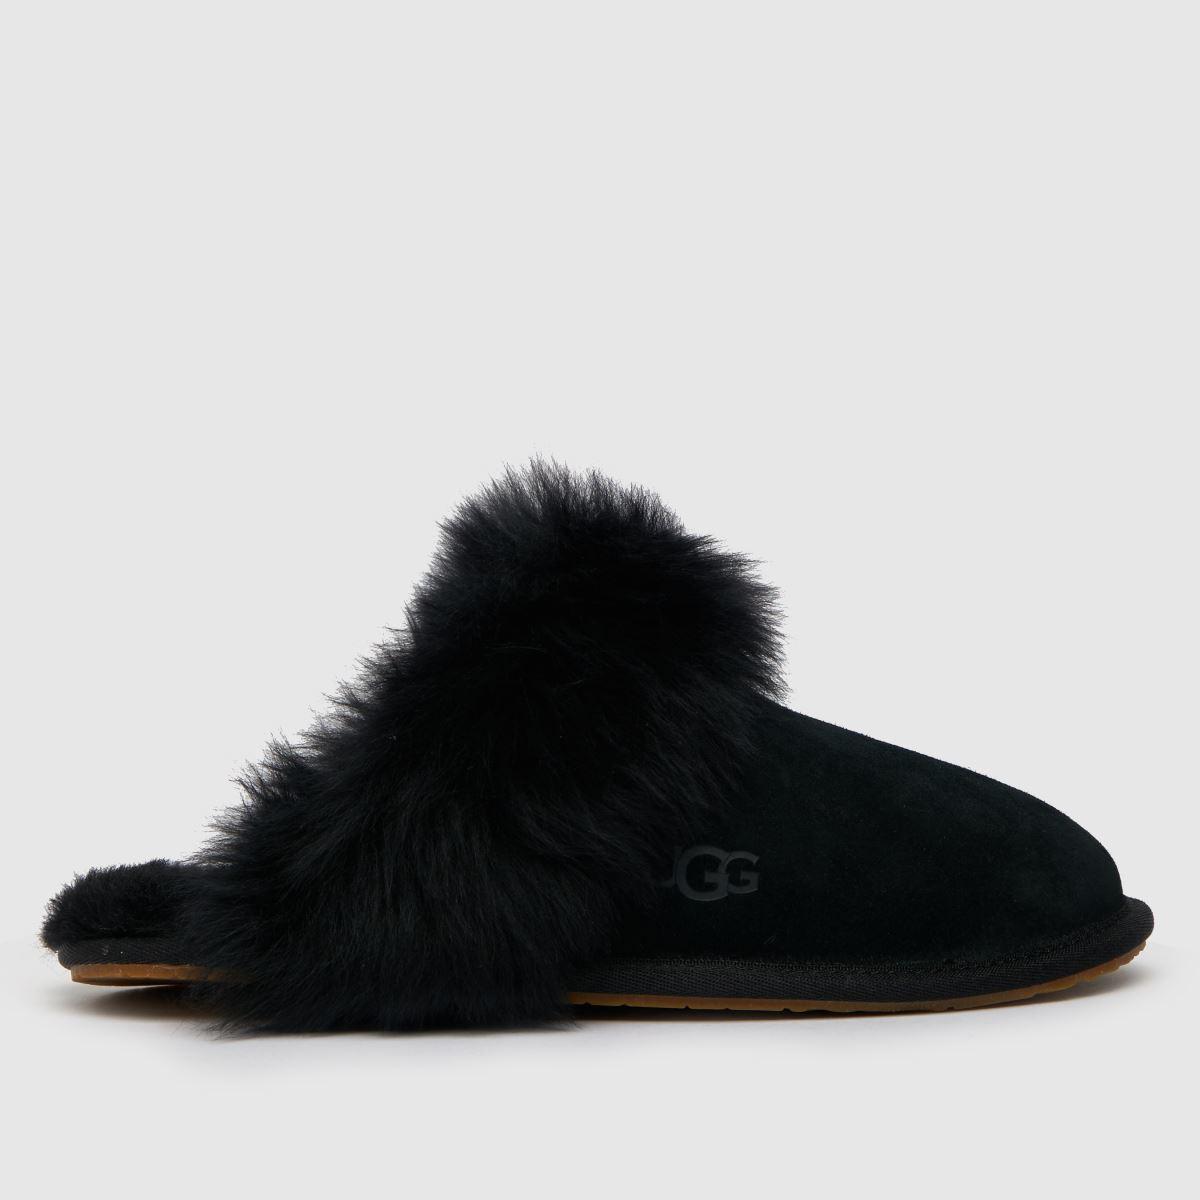 UGG Black Scuff Sis Slippers